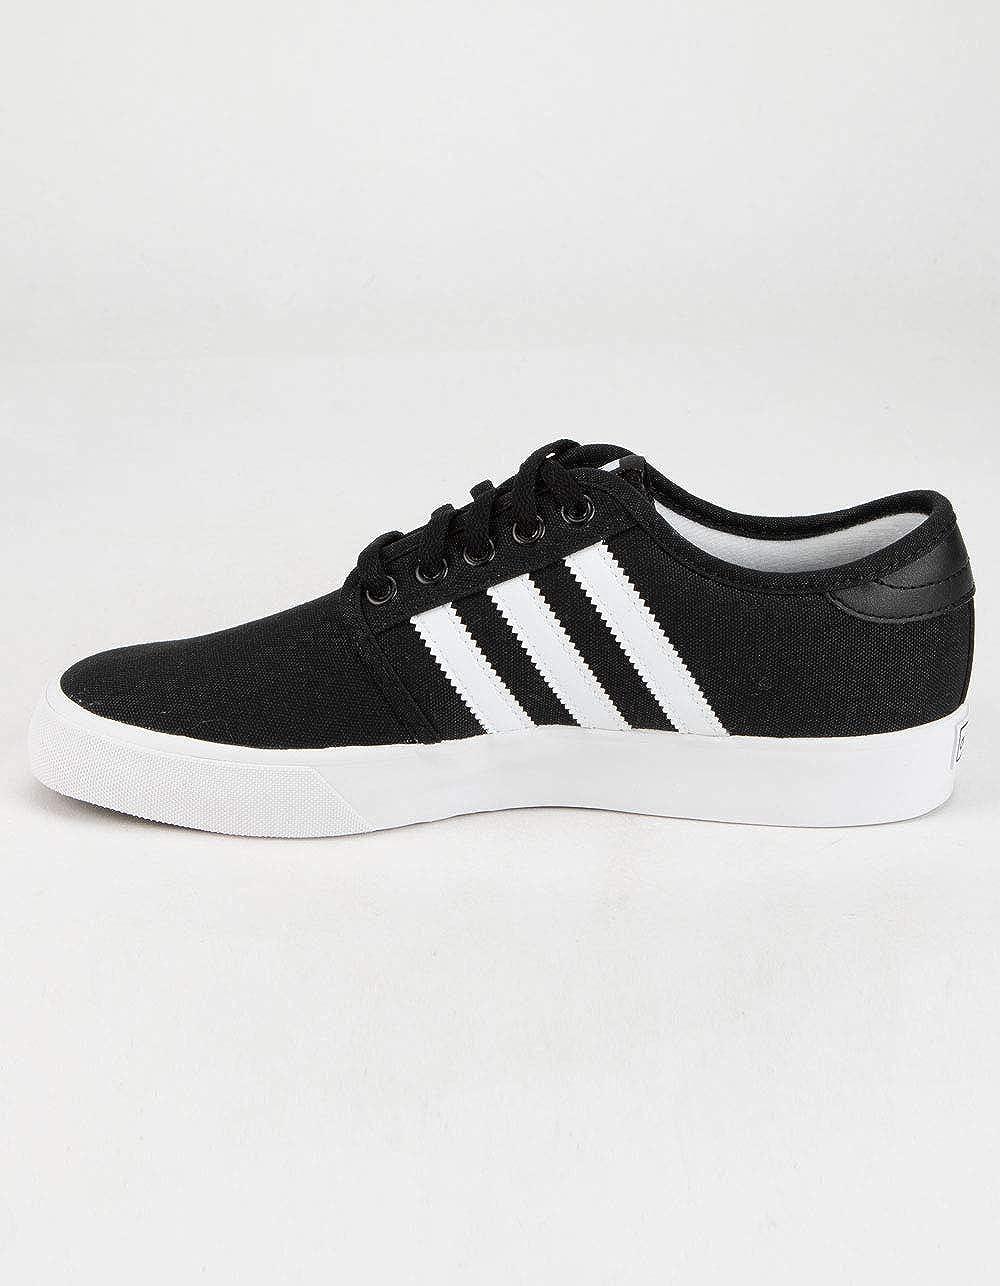 adidas Seeley J Boys Black & White Shoes   Sneakers - Amazon.com